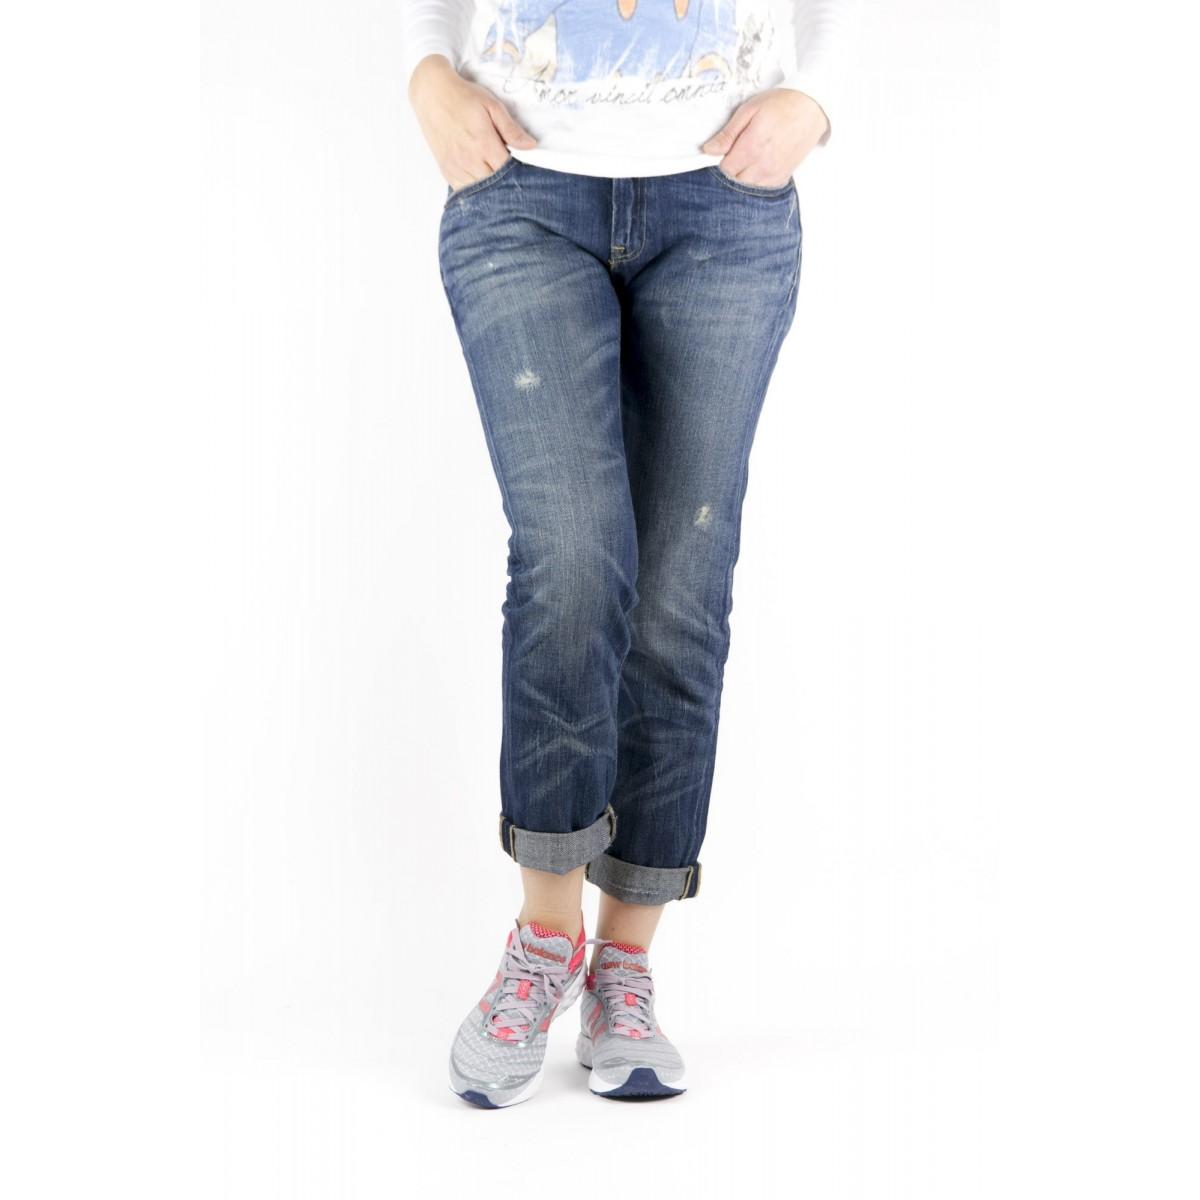 Jeans Ralph Lauren Woman - V60Ioasdc9116